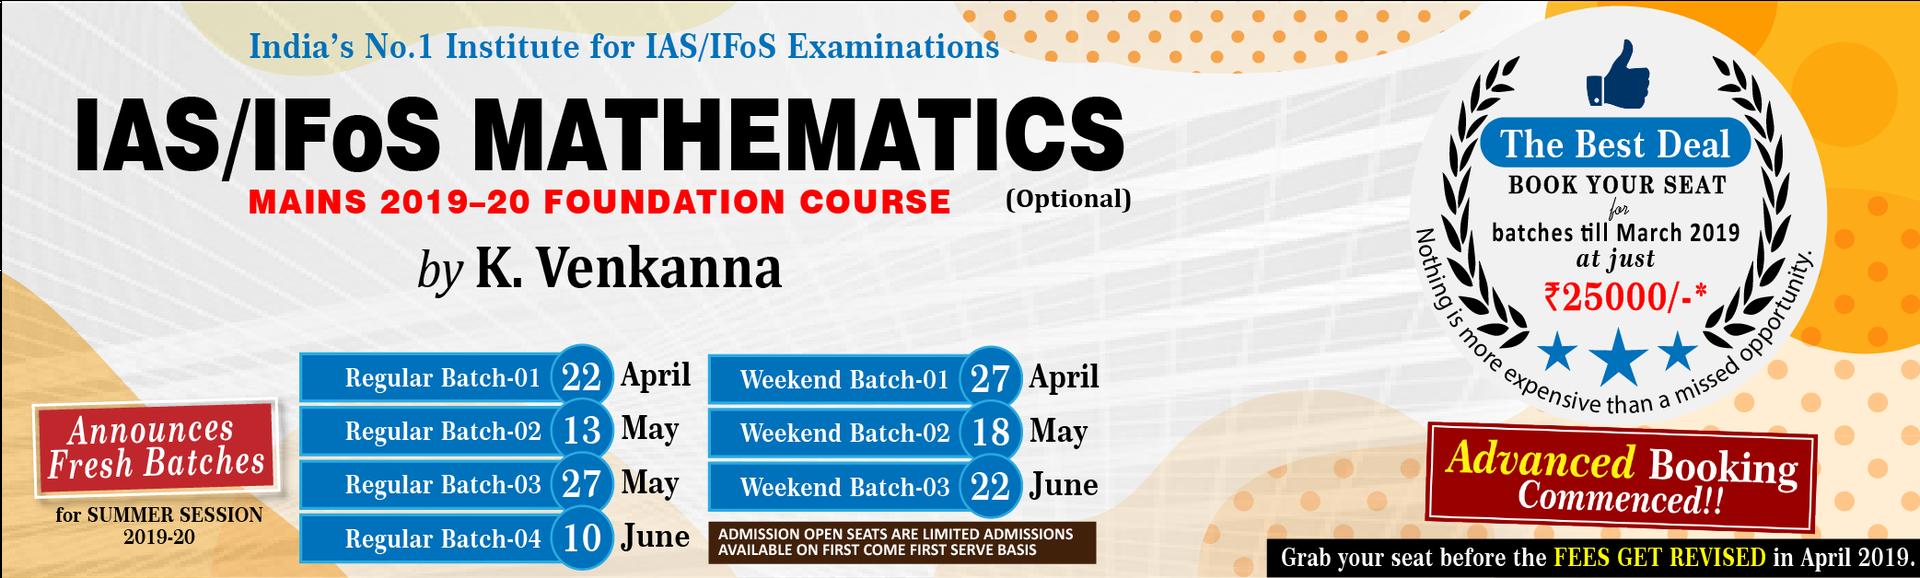 UPSC IAS/IFoS Mathematics Optional Foundation Course for Summer